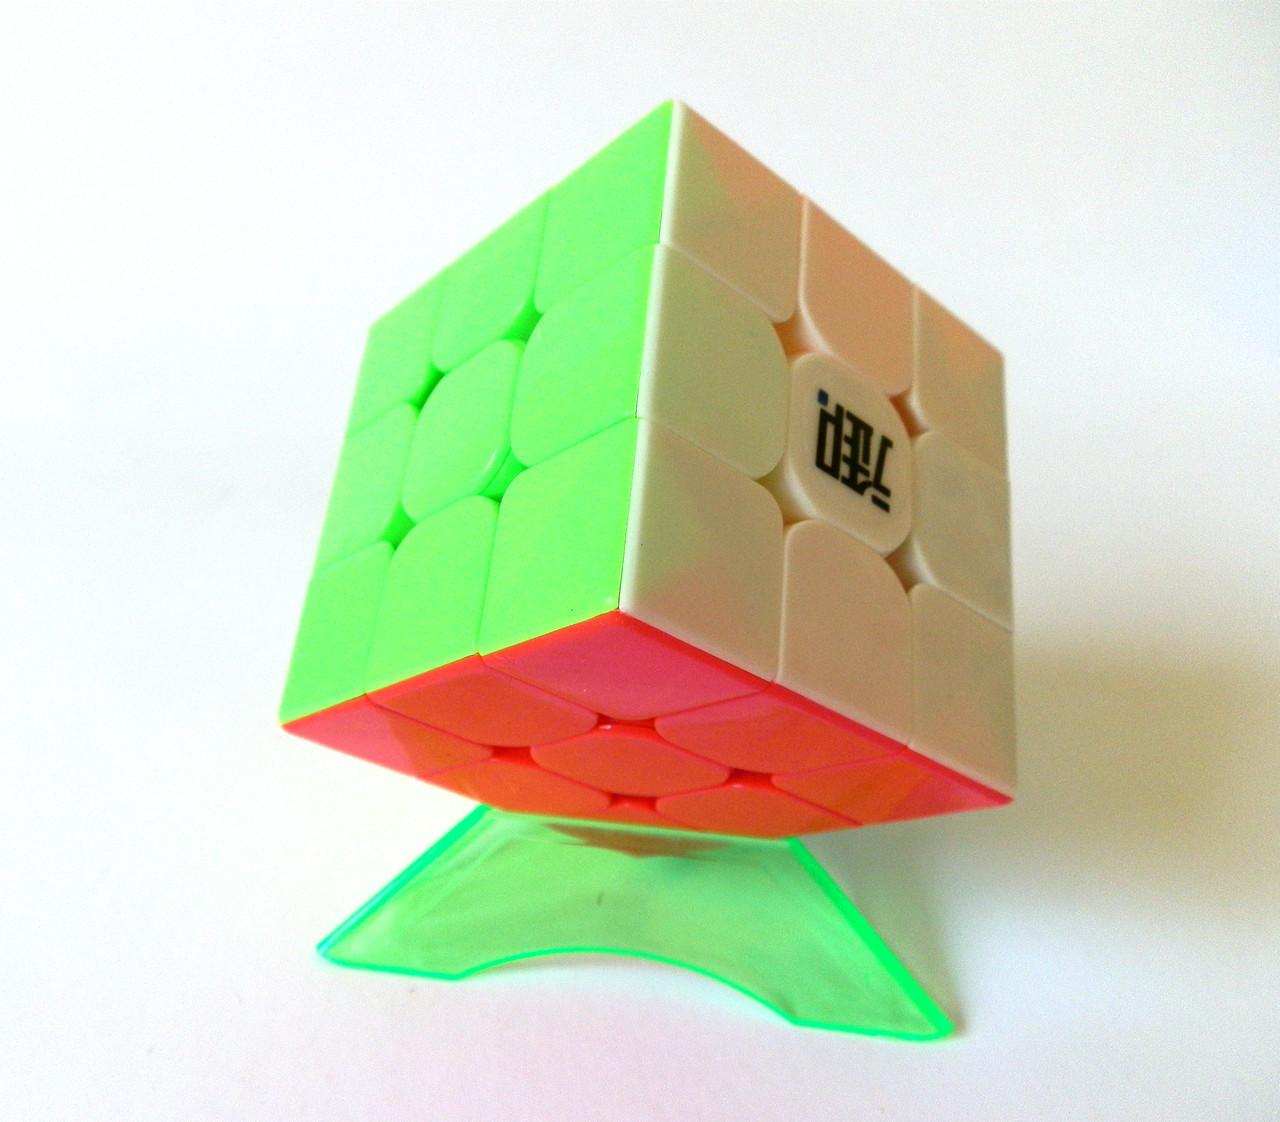 3x3 KungFu GUANLONG black | Скоростной кубик 3х3 КунгФу Гуанлонг